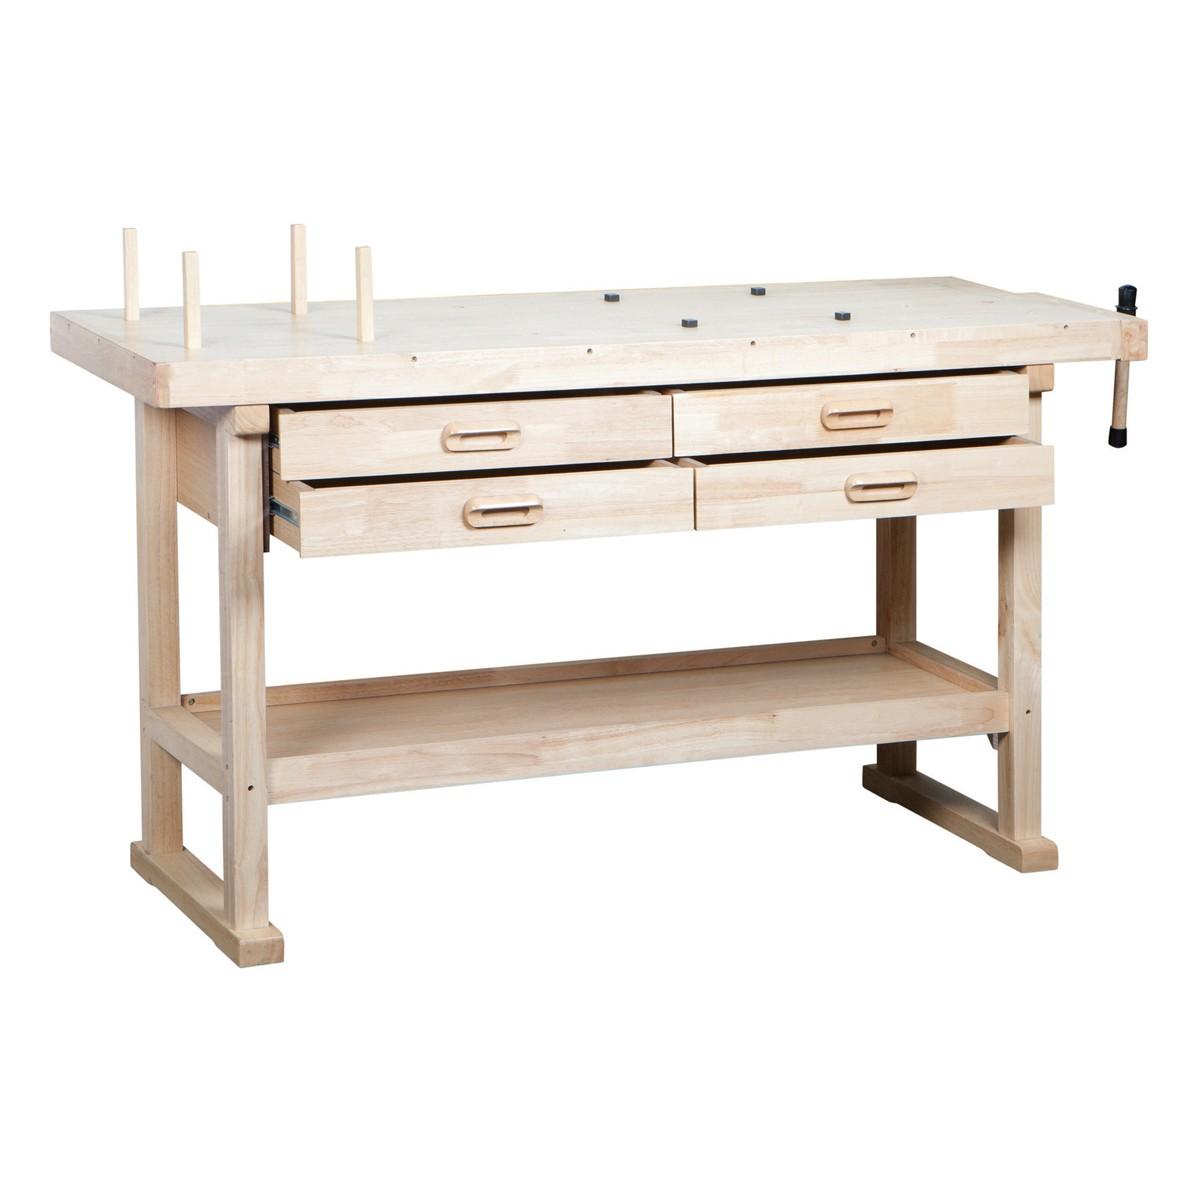 DIY Hardwood Workbench with Drawers